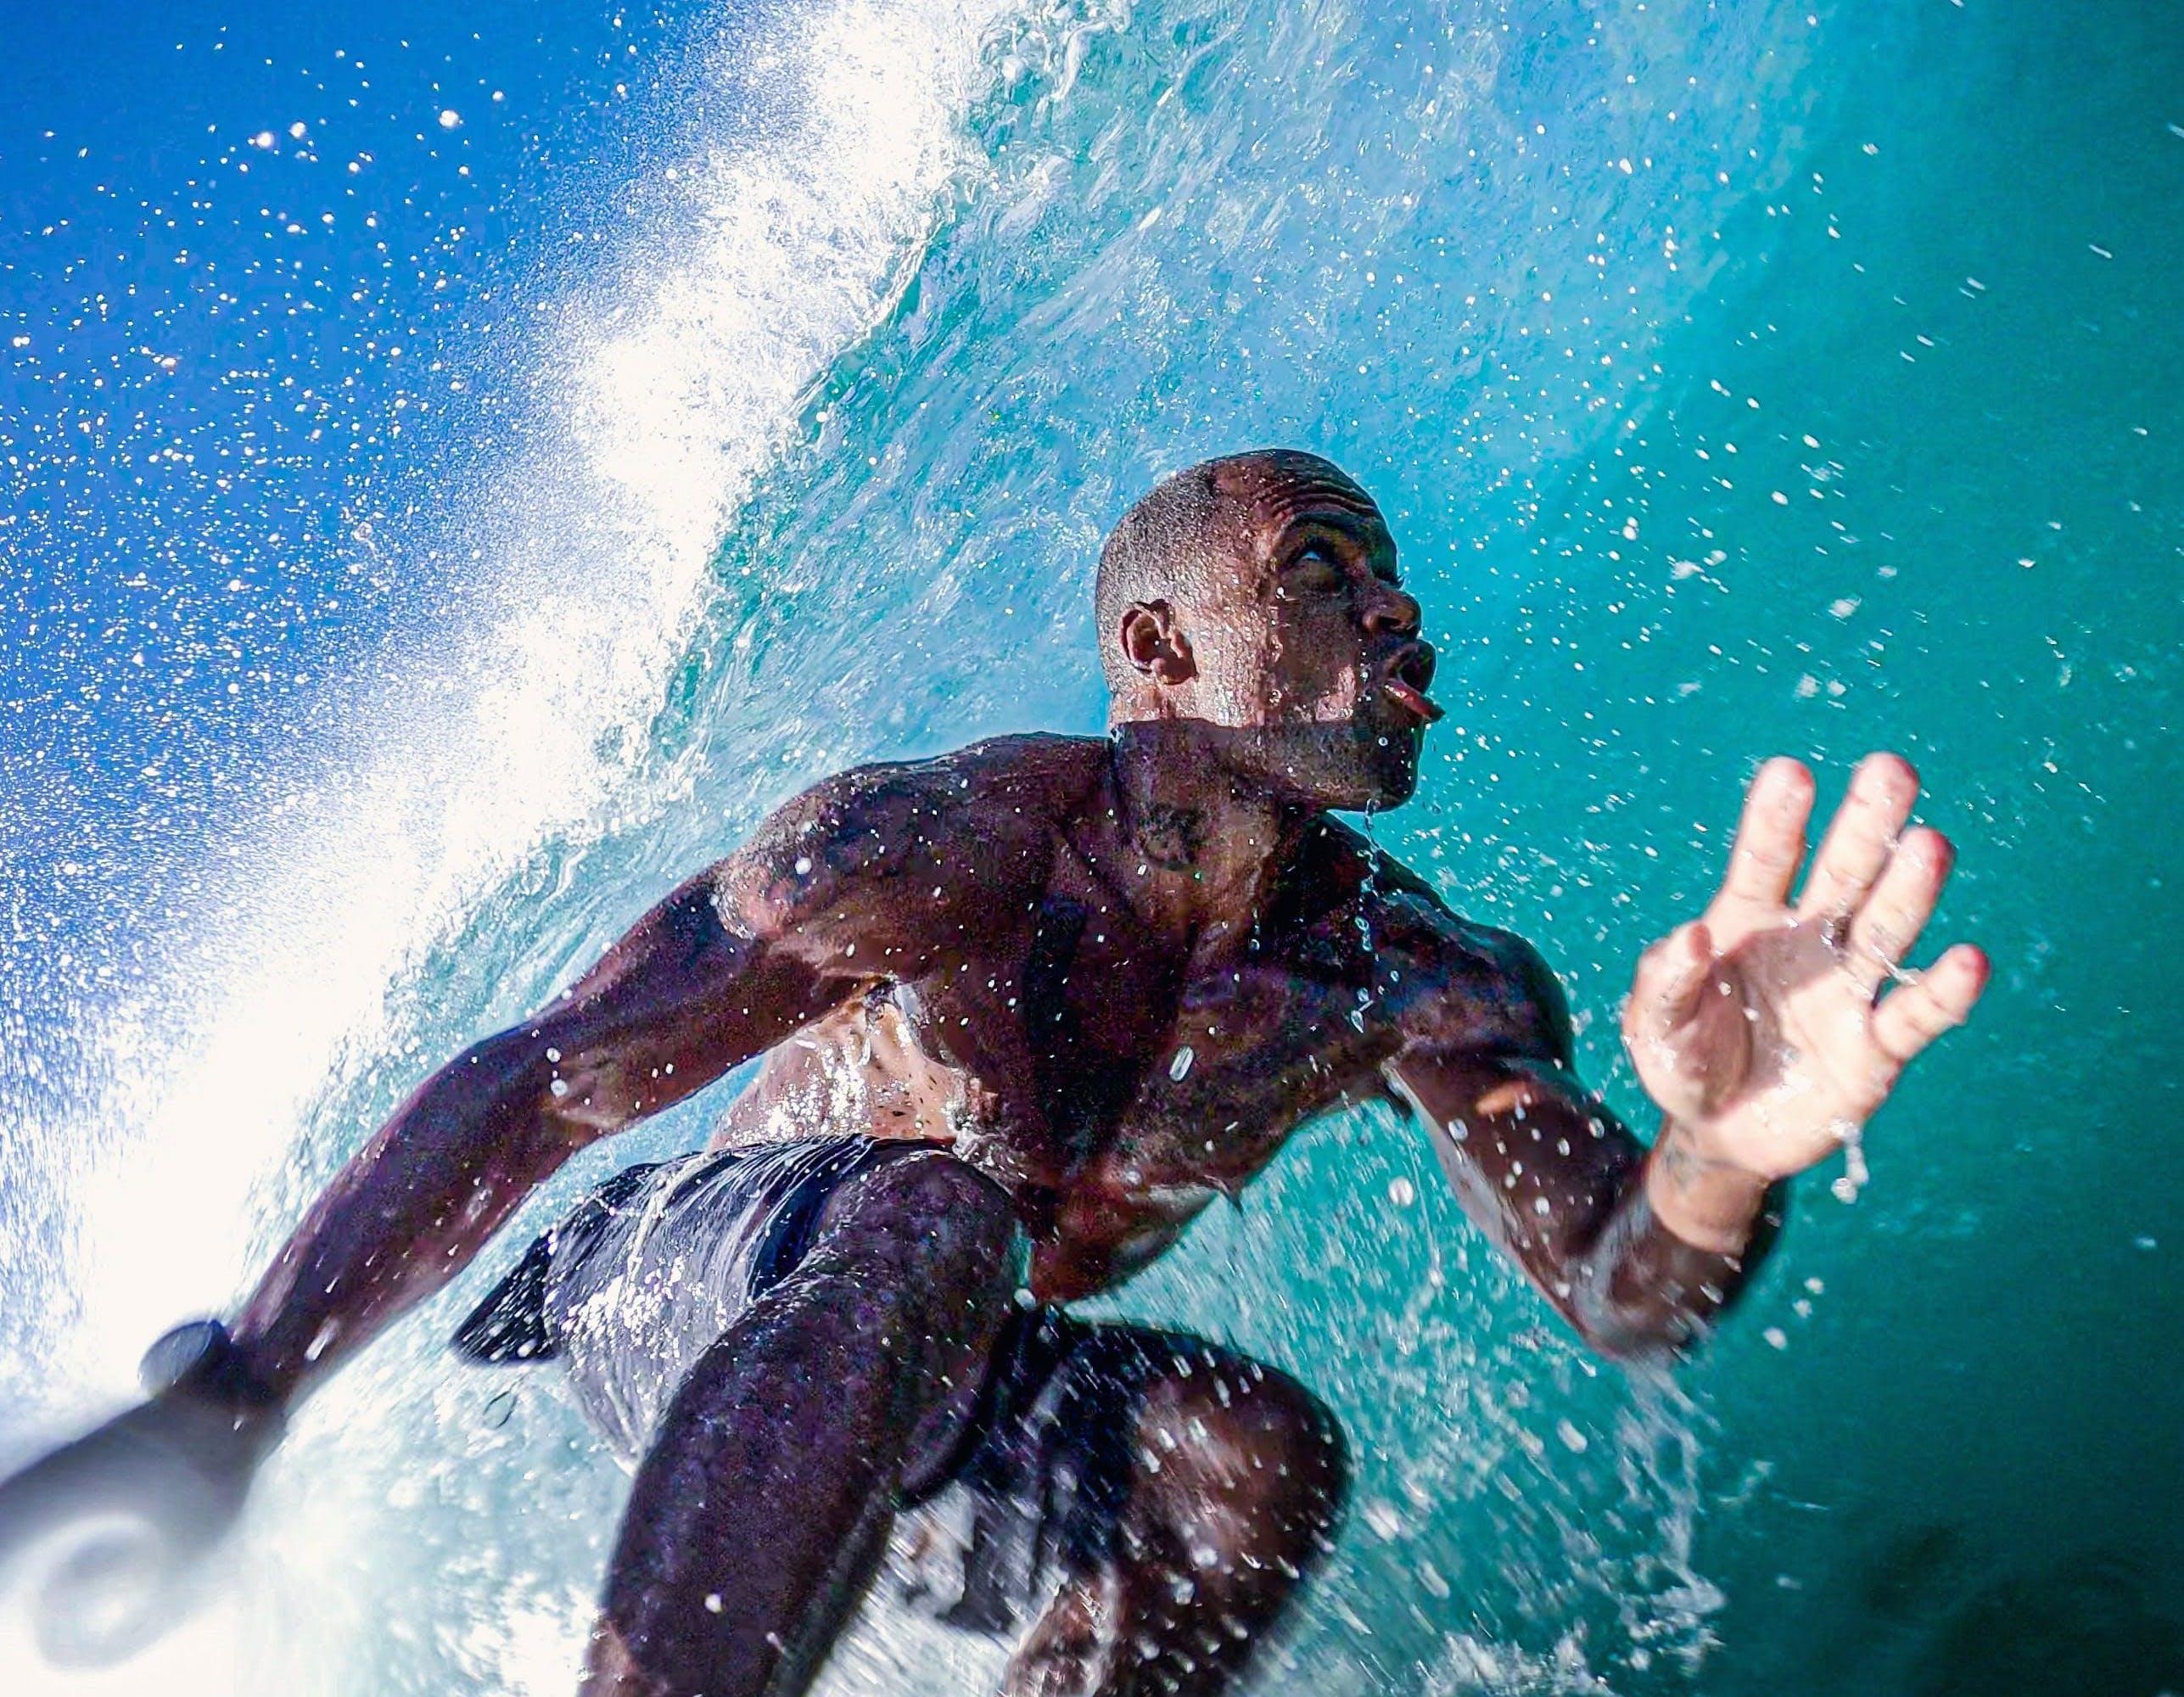 King surfs a wave